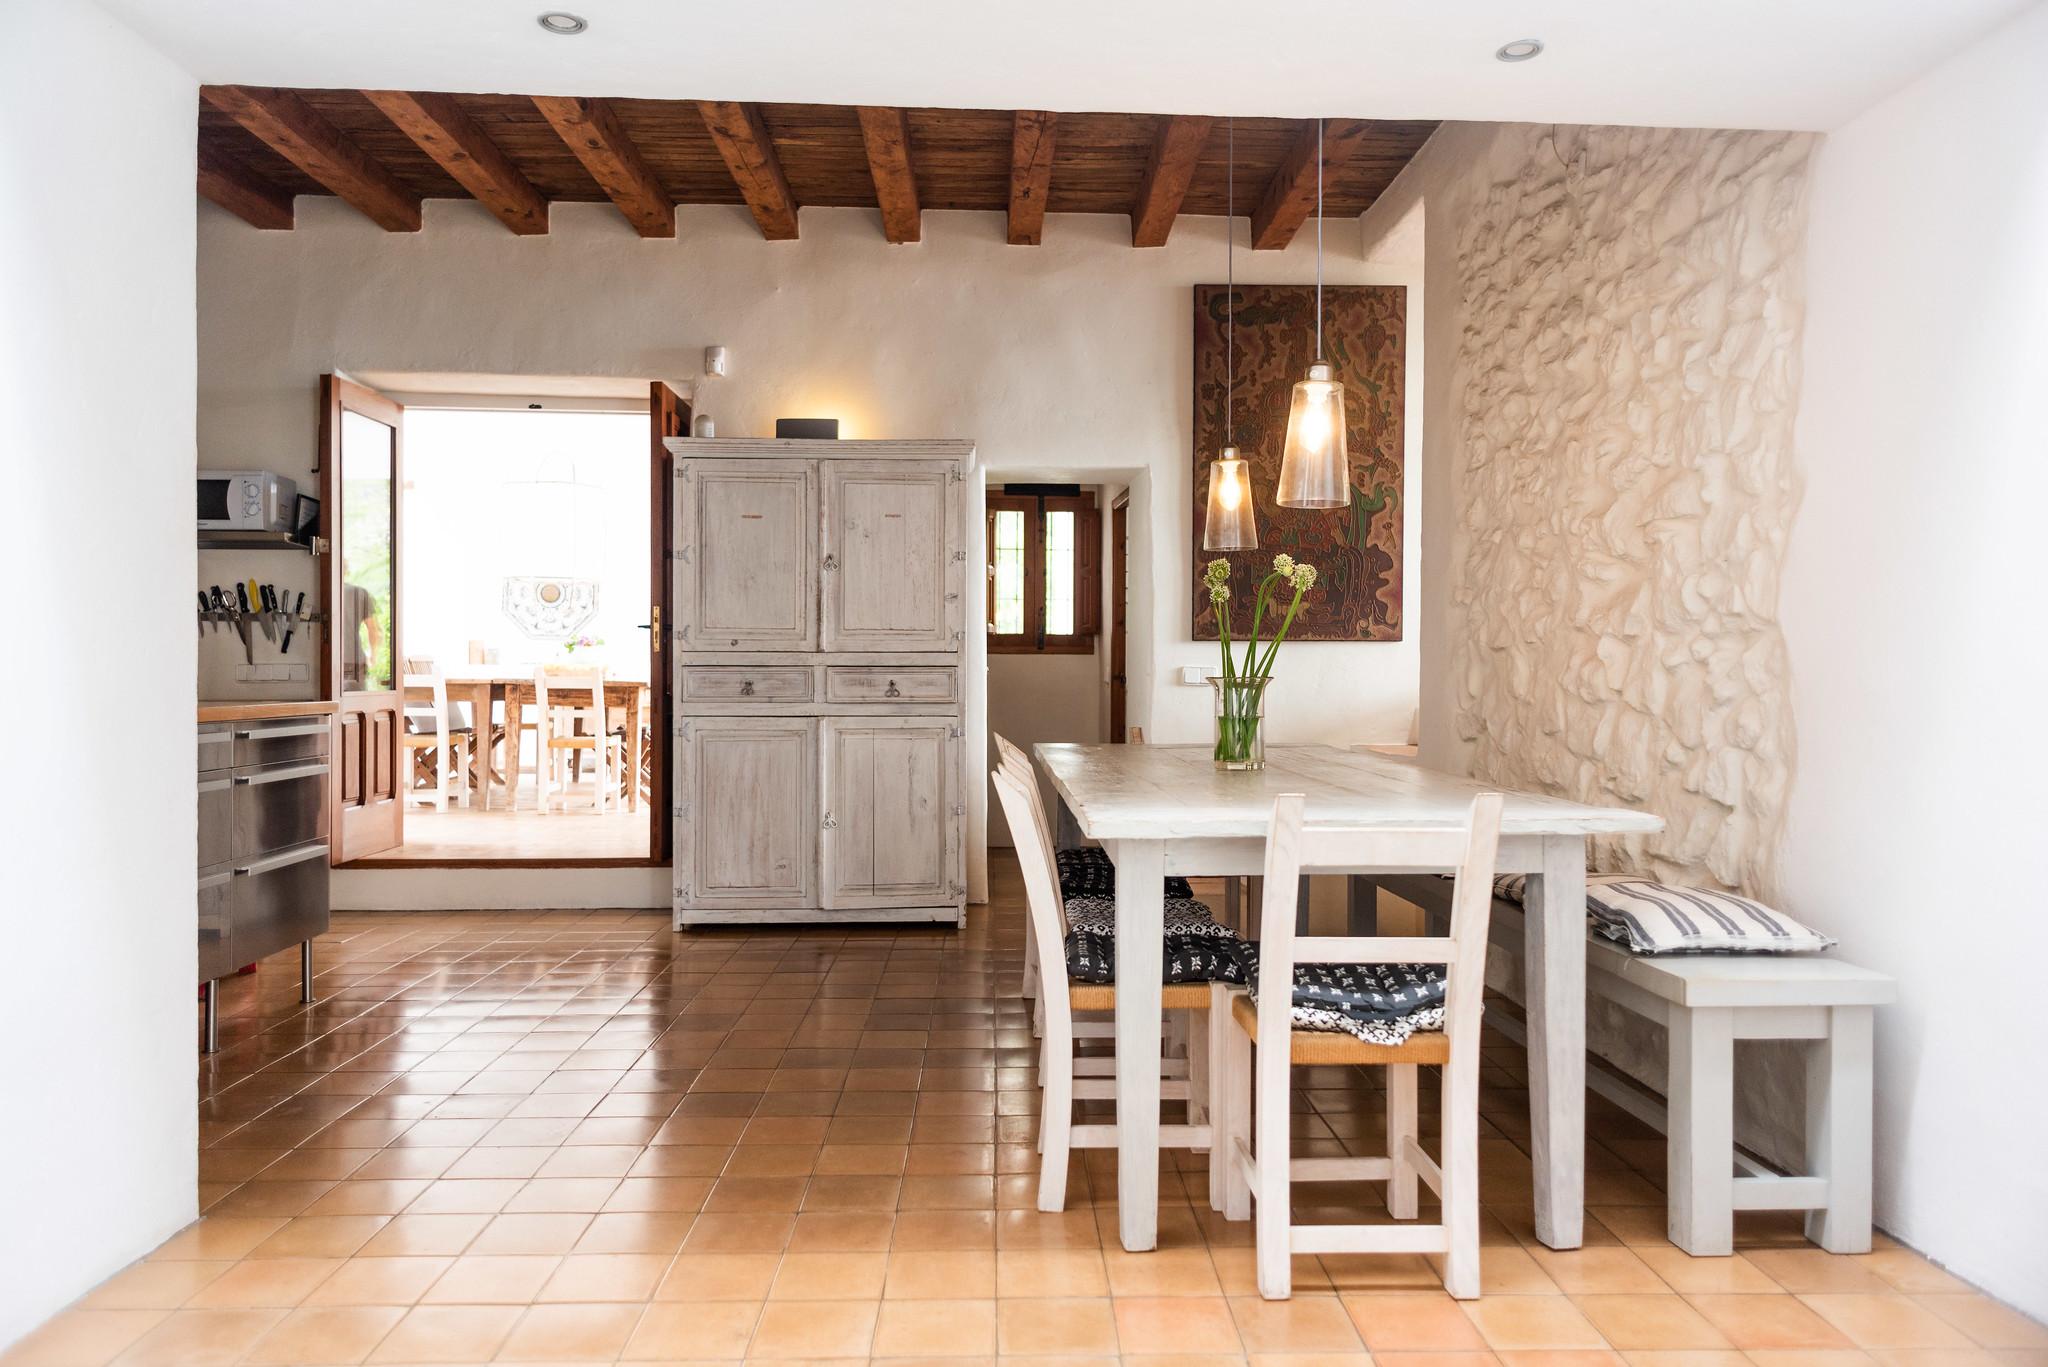 https://www.white-ibiza.com/wp-content/uploads/2020/05/white-ibiza-villas-can-lyra-breakfast-table.jpg